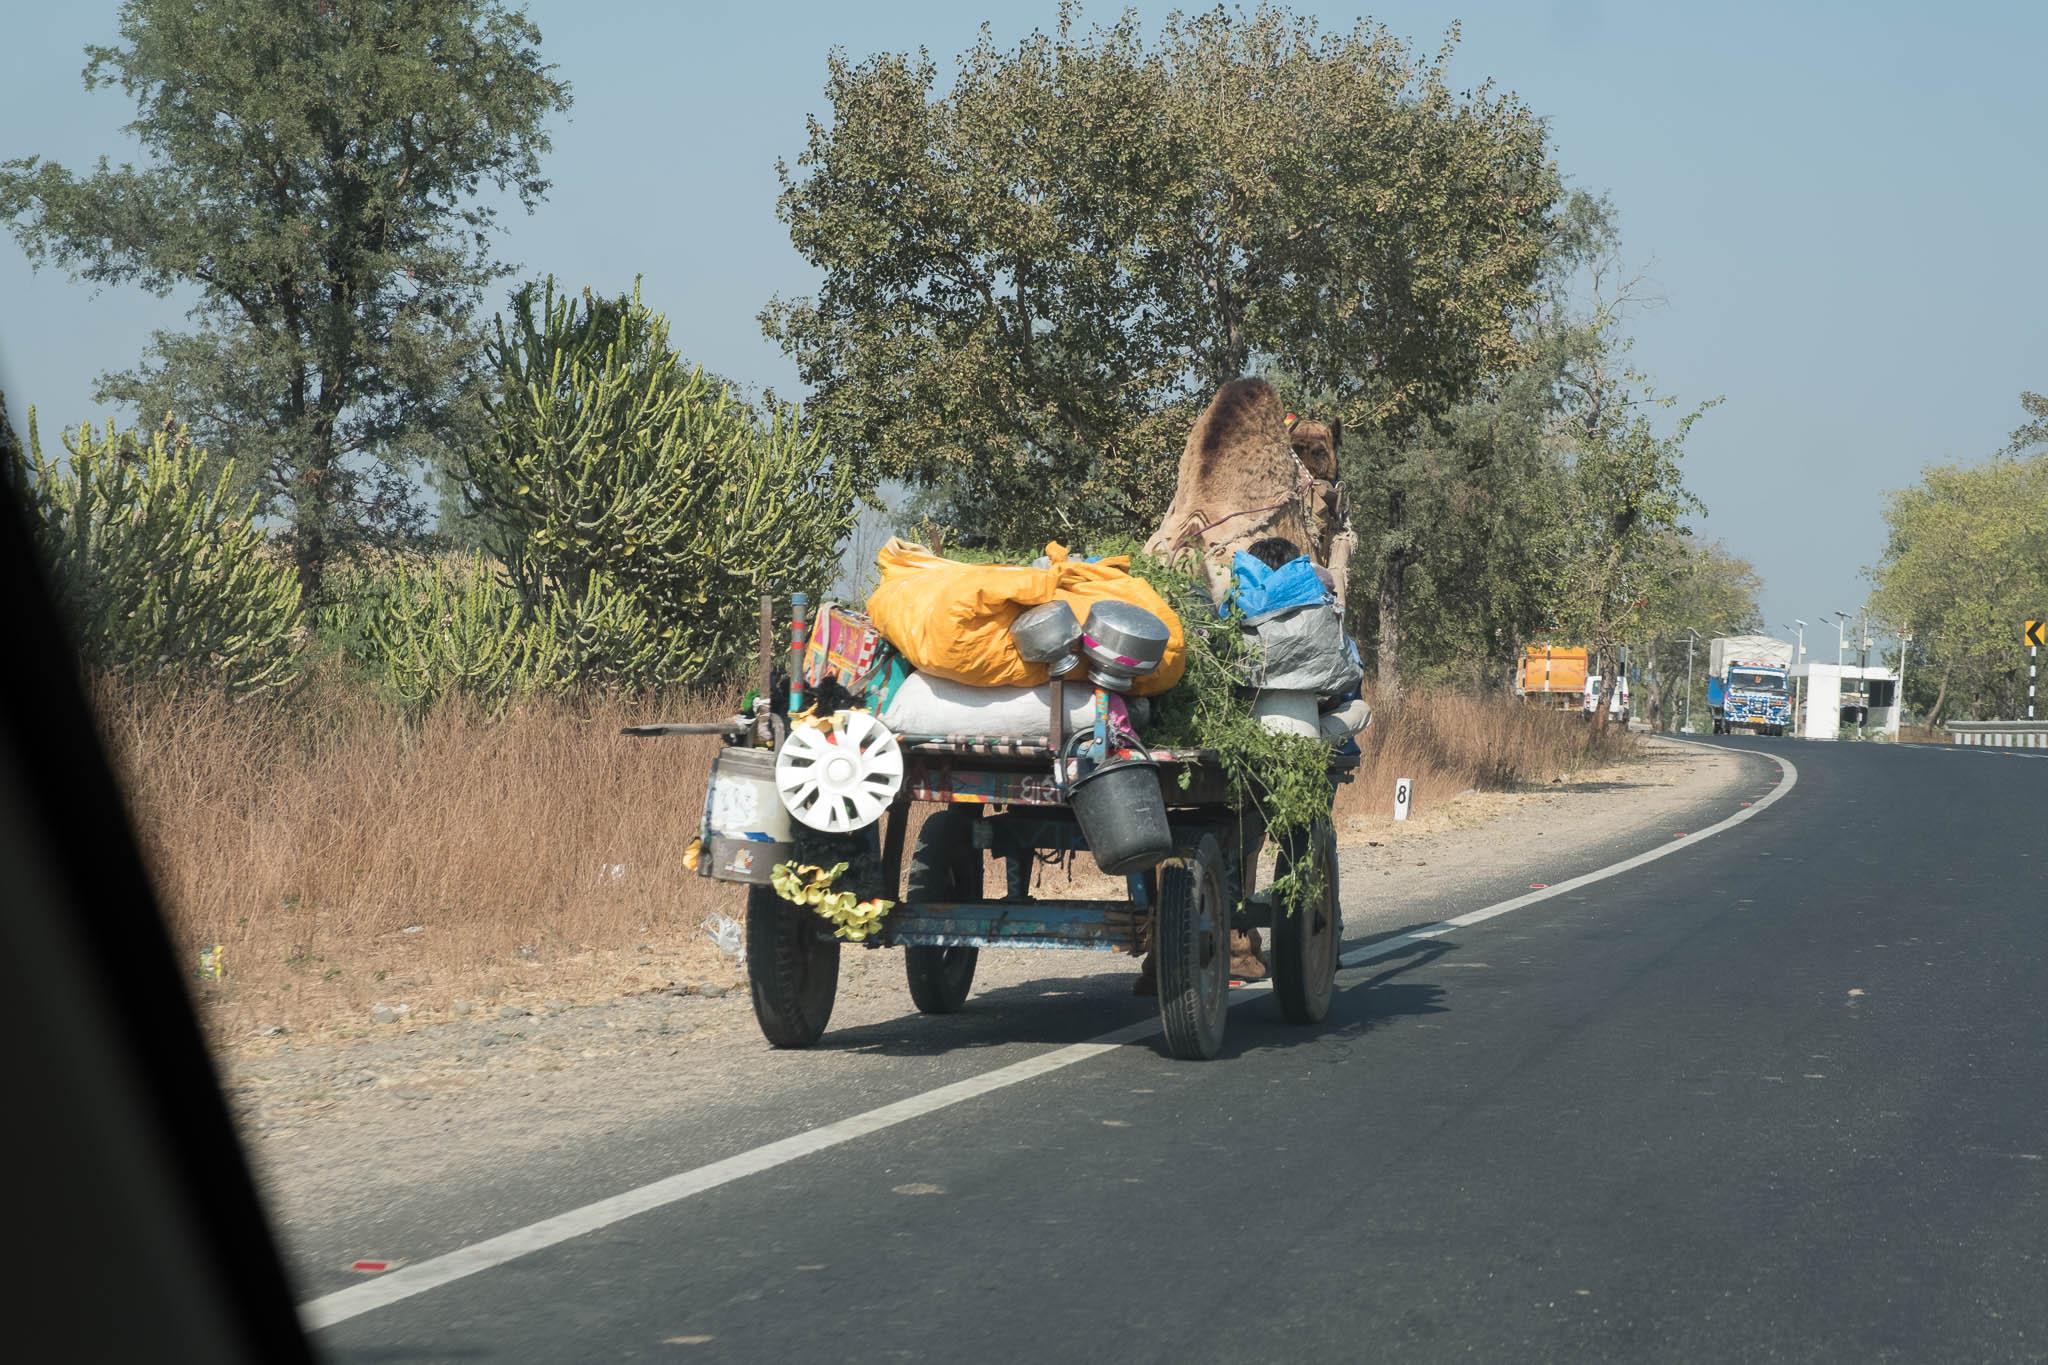 India-2017-7298.jpg